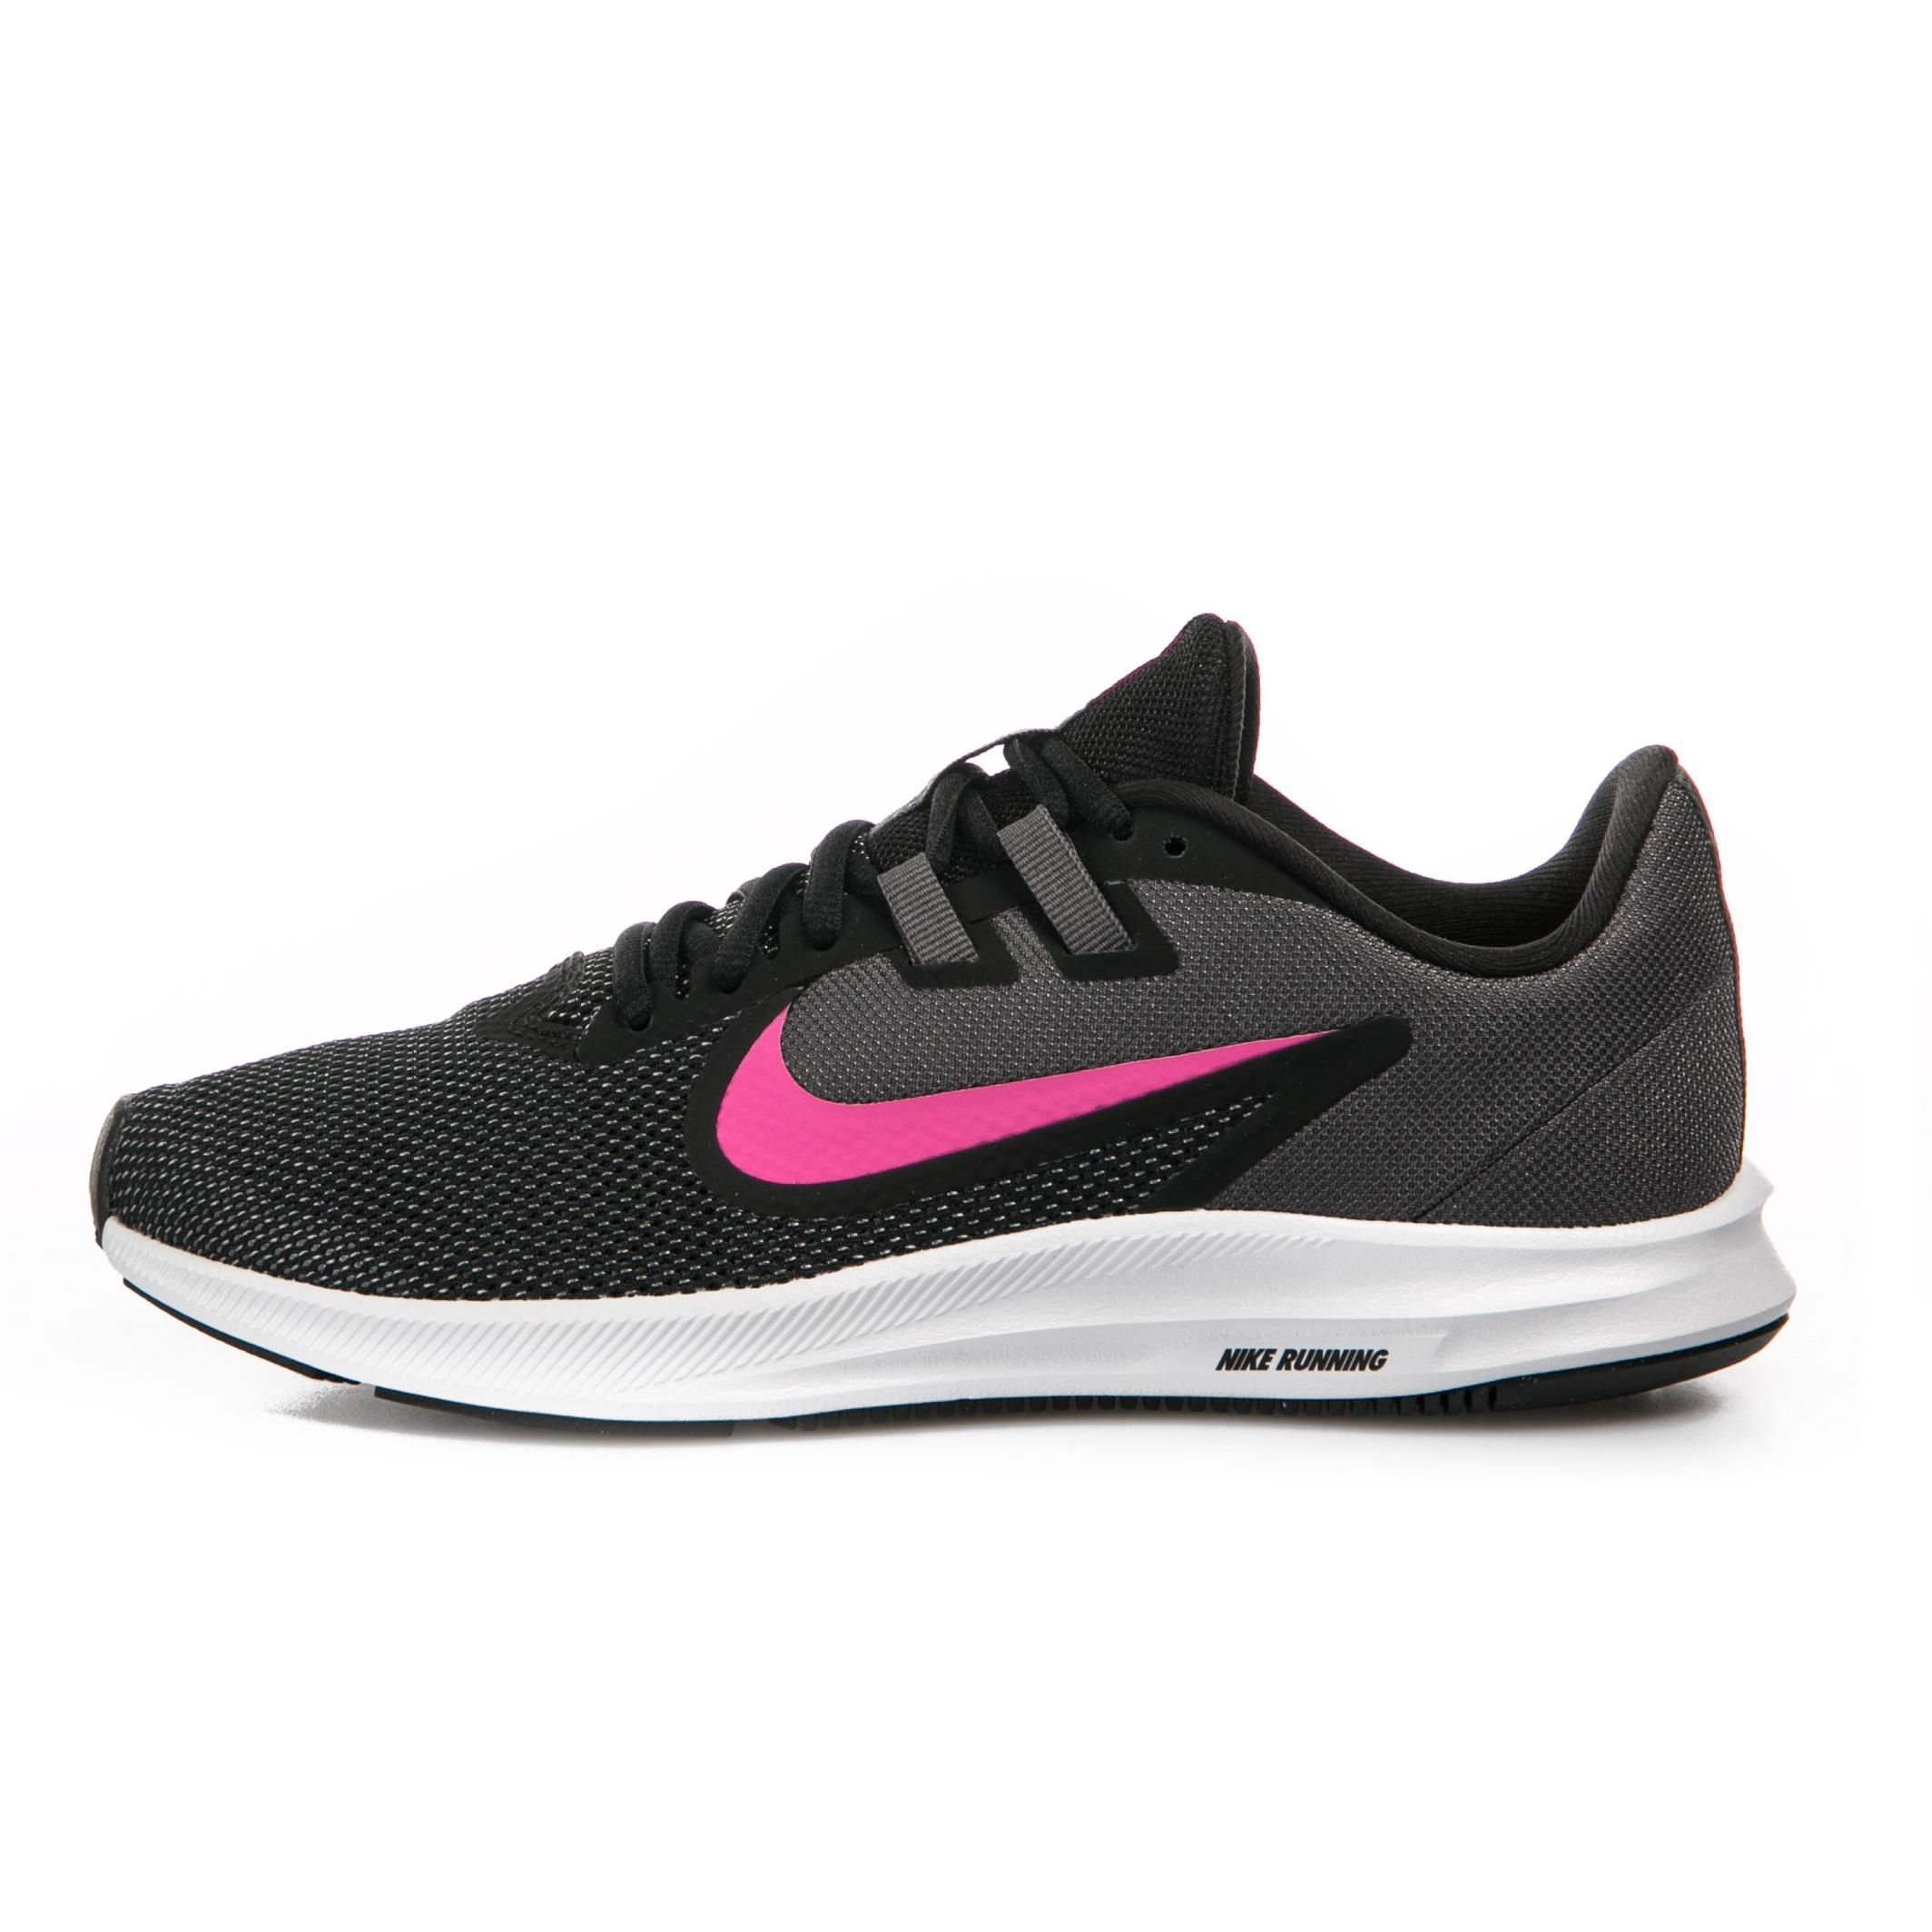 c1a093256e4 Nike Downshifter 9 - Womens Running Shoes (AQ7486 002) - Sklavounos ...